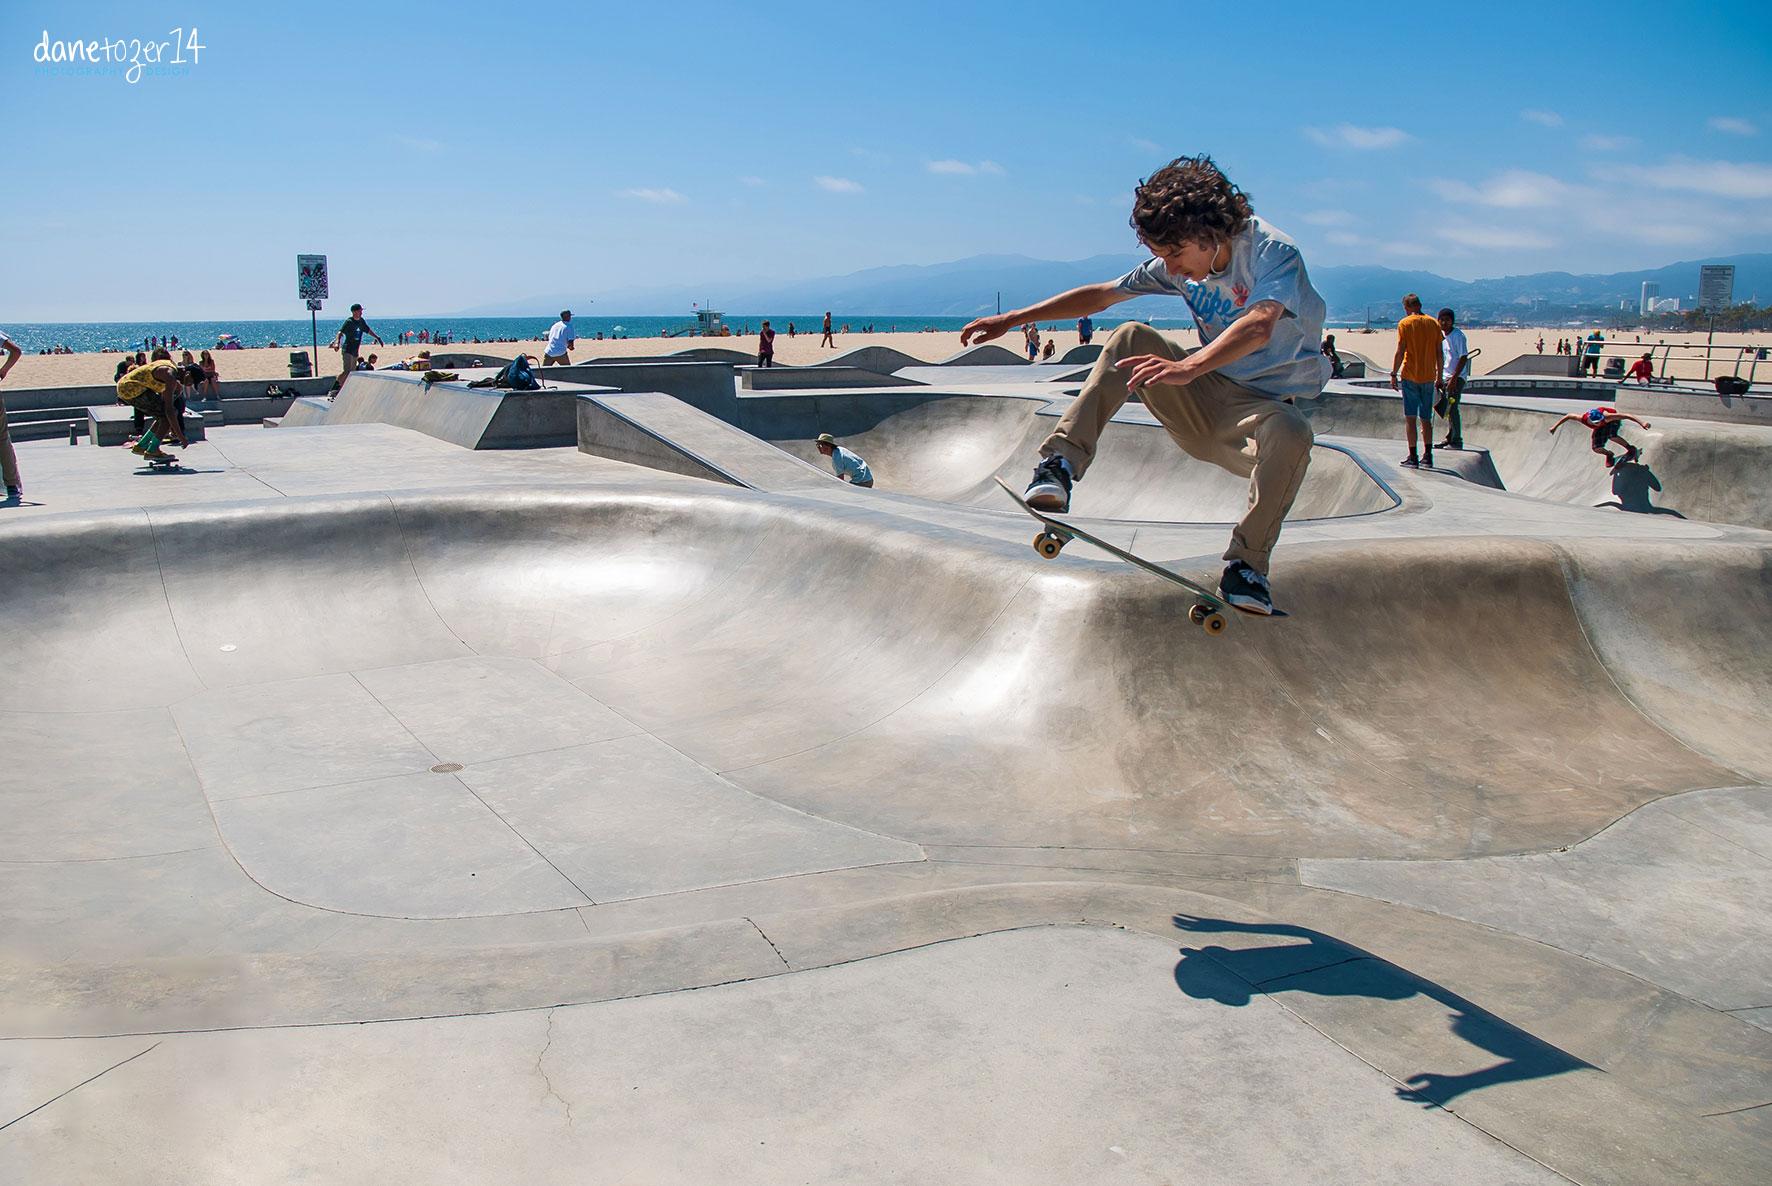 Venice Beach, Los Angeles U.S.A